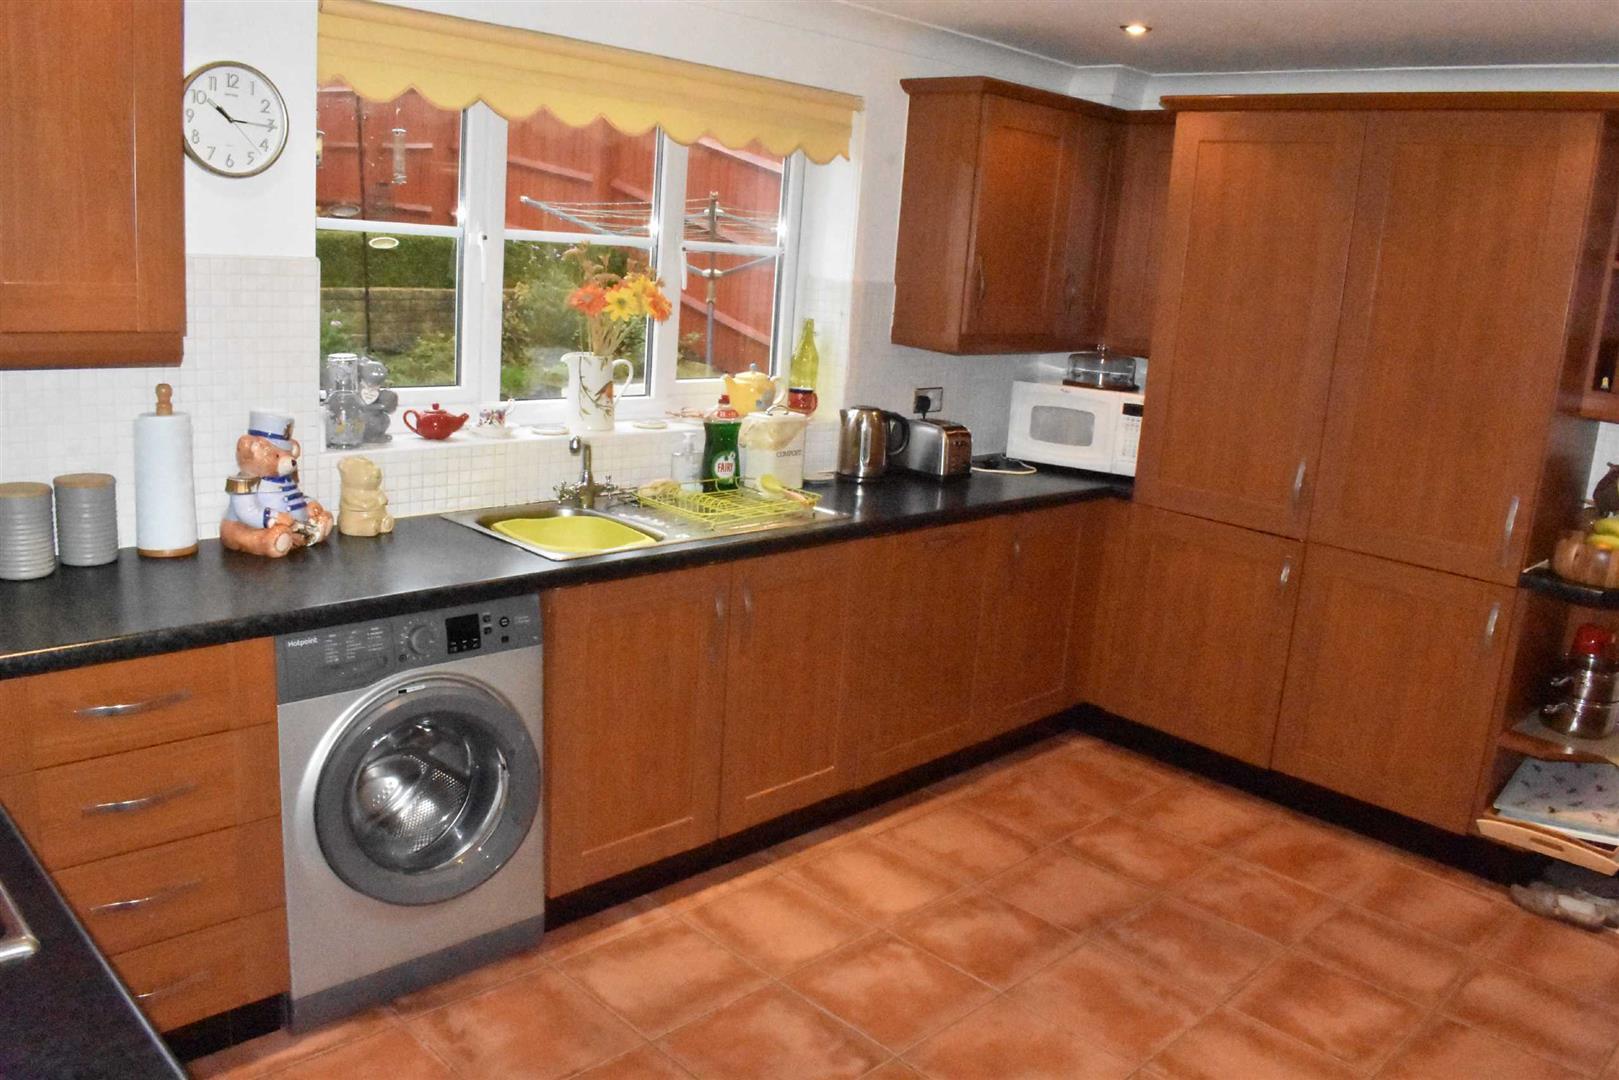 Sunnymead Close, Cockett, Swansea, SA1 6SD